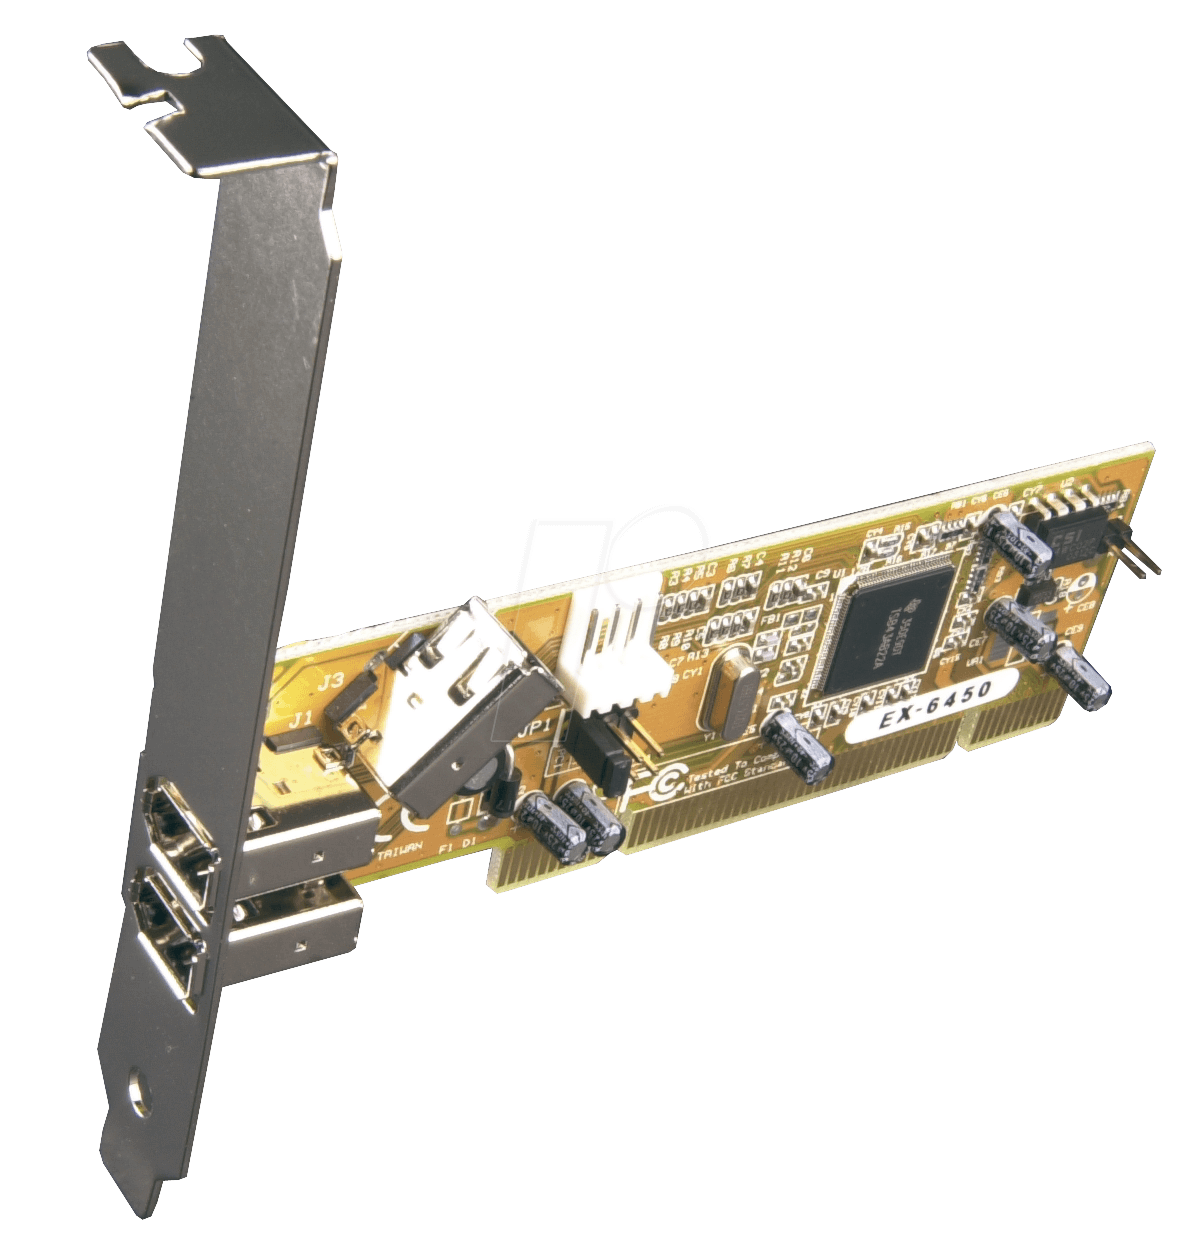 Exsys Ex 6450 Karta Firewire Exsys Bei Reichelt Elektronik